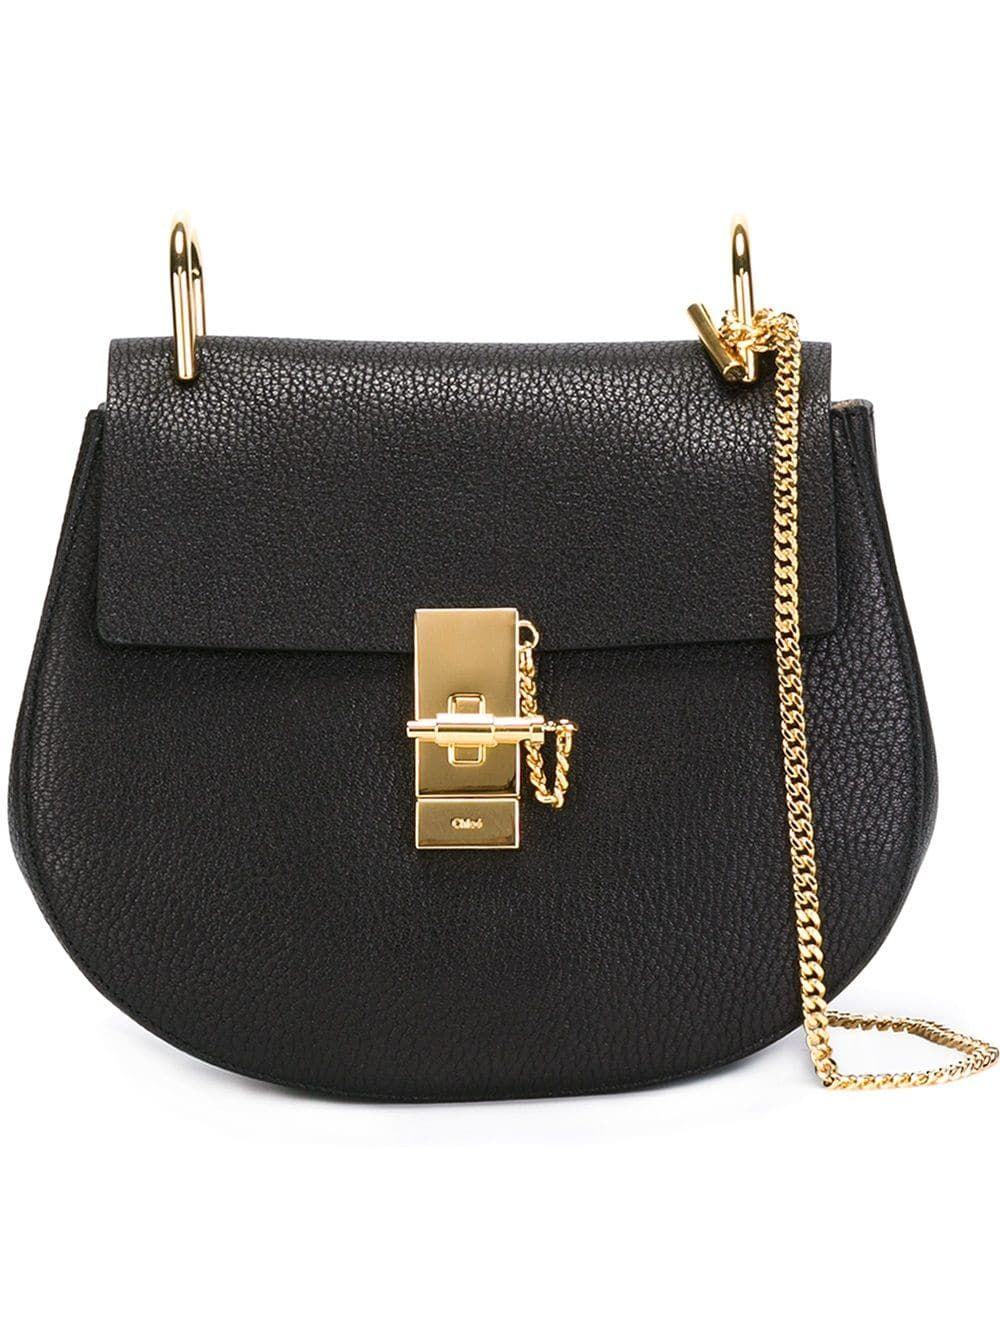 Chloé Small Drew Shoulder Bag Black